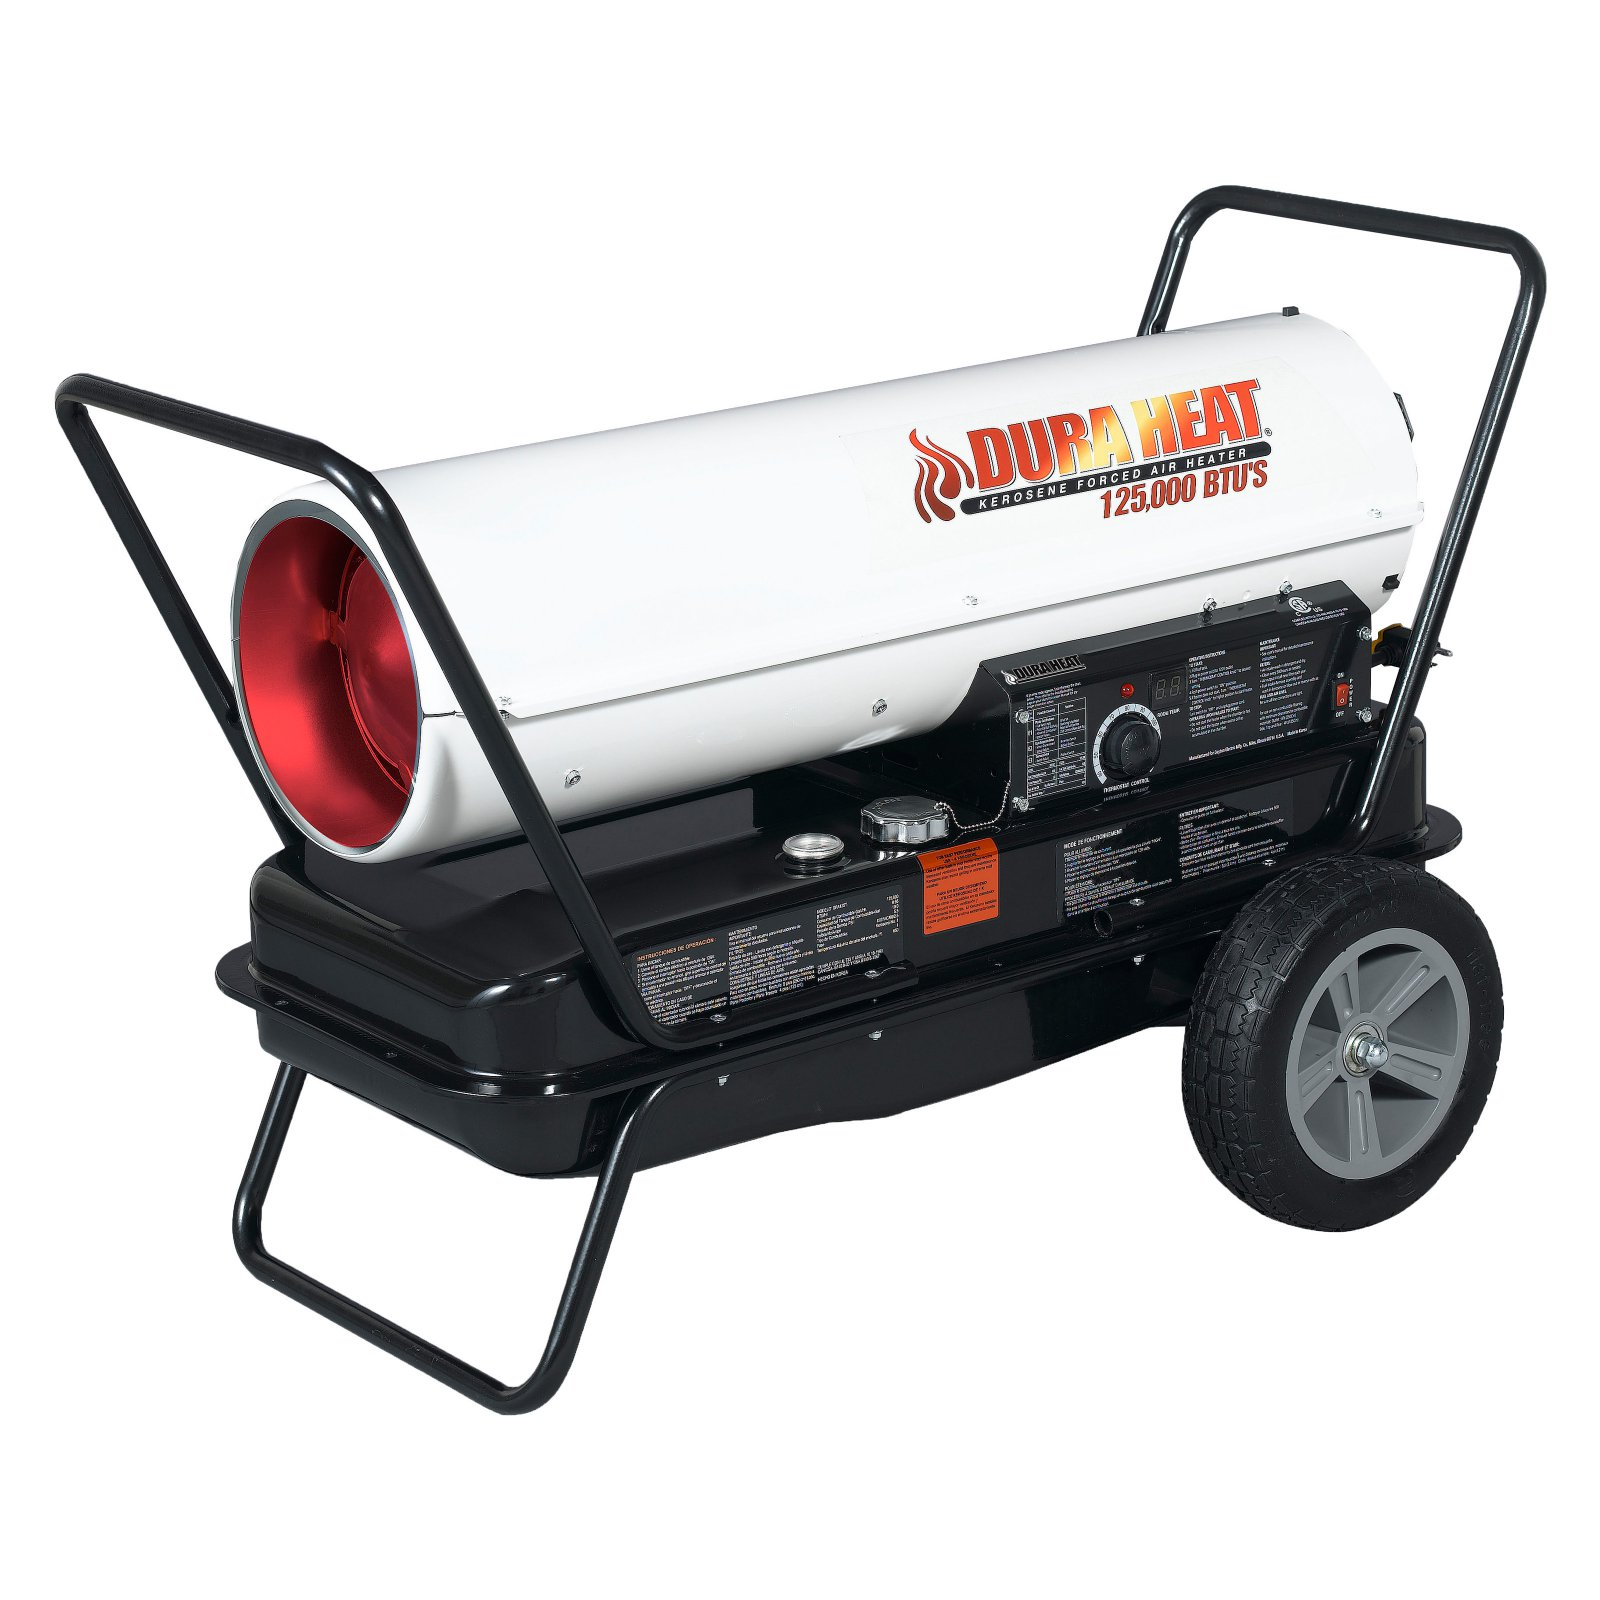 Dura Heat Heavy Duty Forced Air Utility Heater 135,000